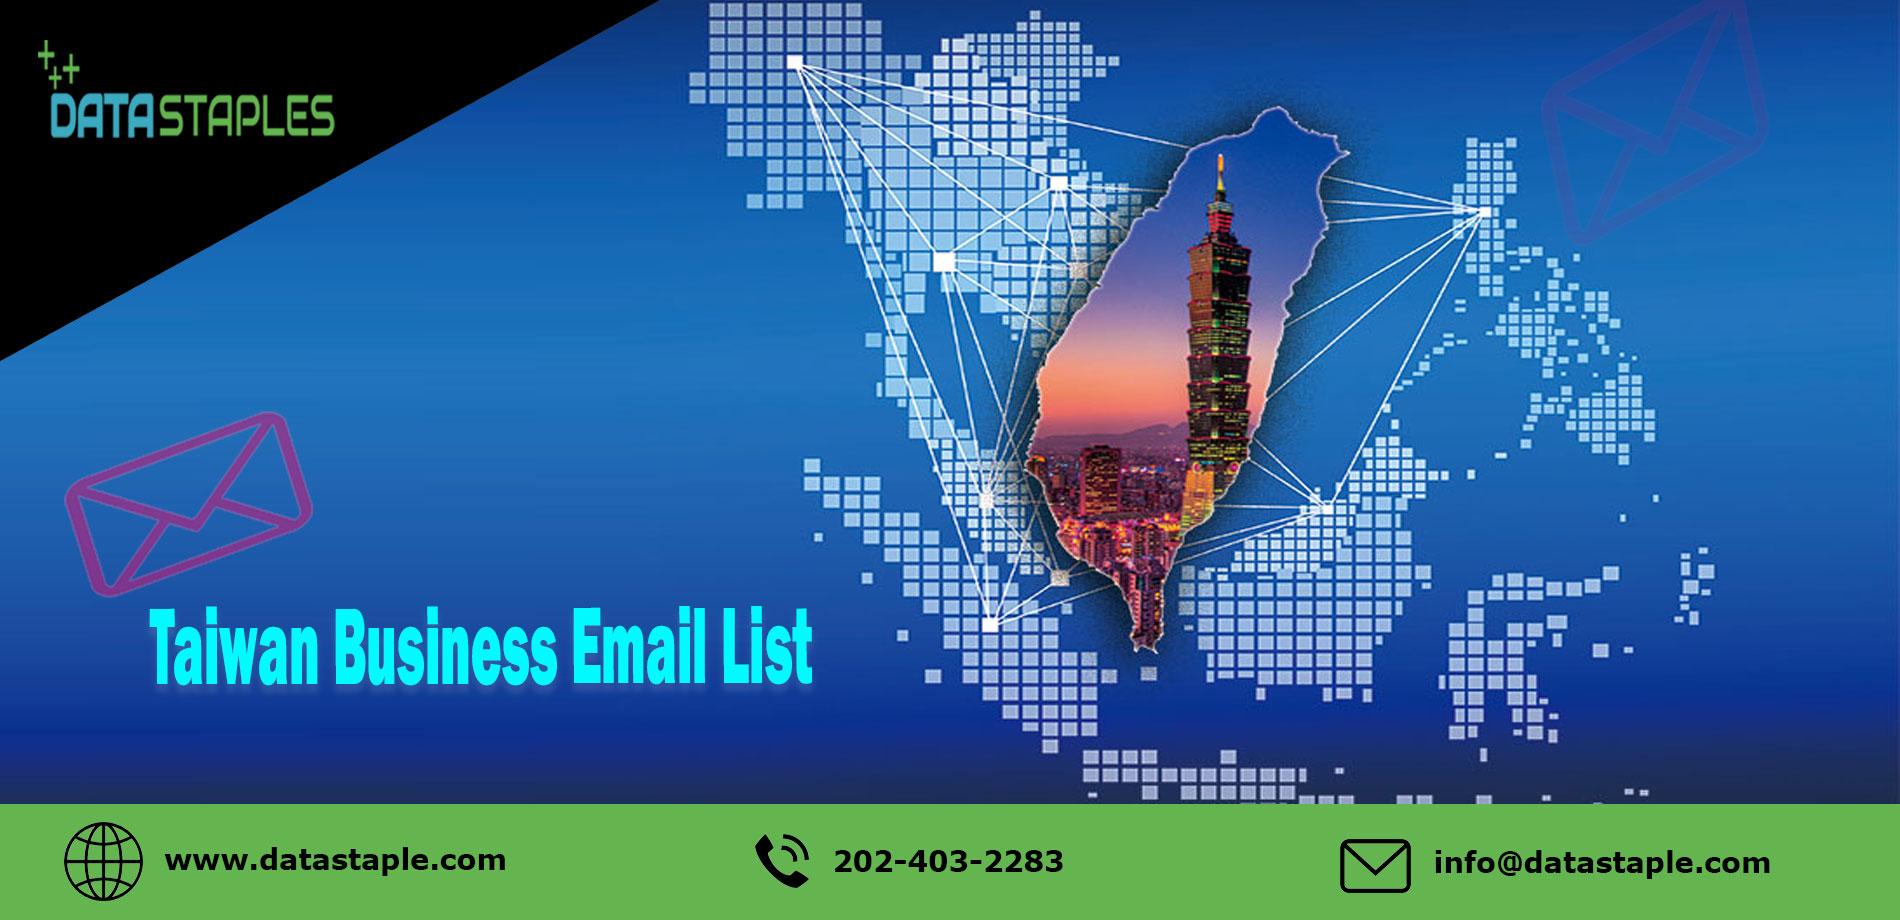 Taiwan Business Email List   DataStaples